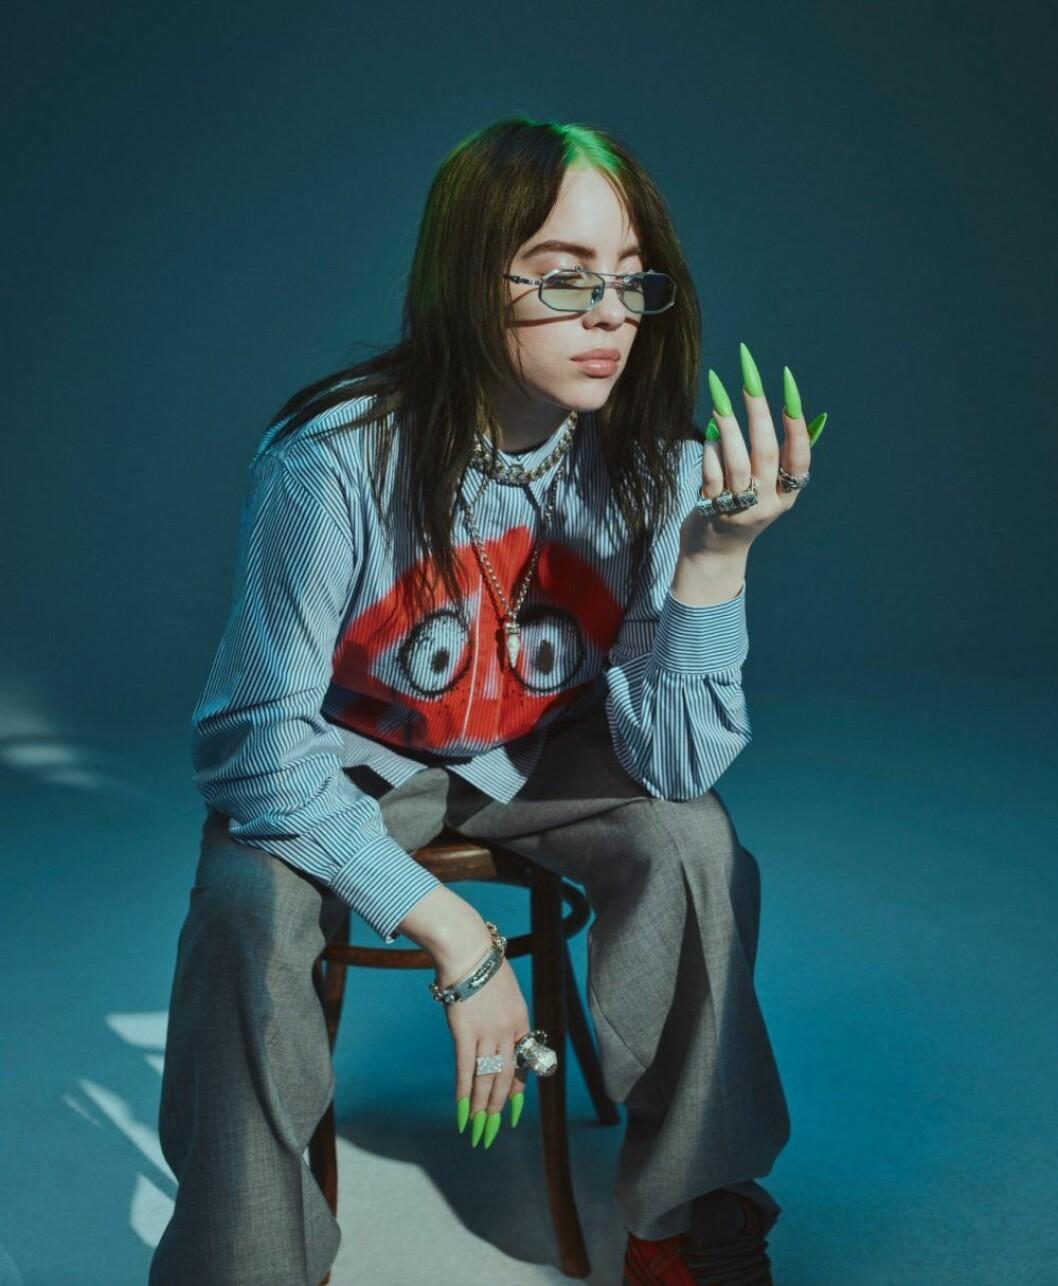 Billie Eilish i exklusiv intervju i ELLE, skjorta från Moschino Couture